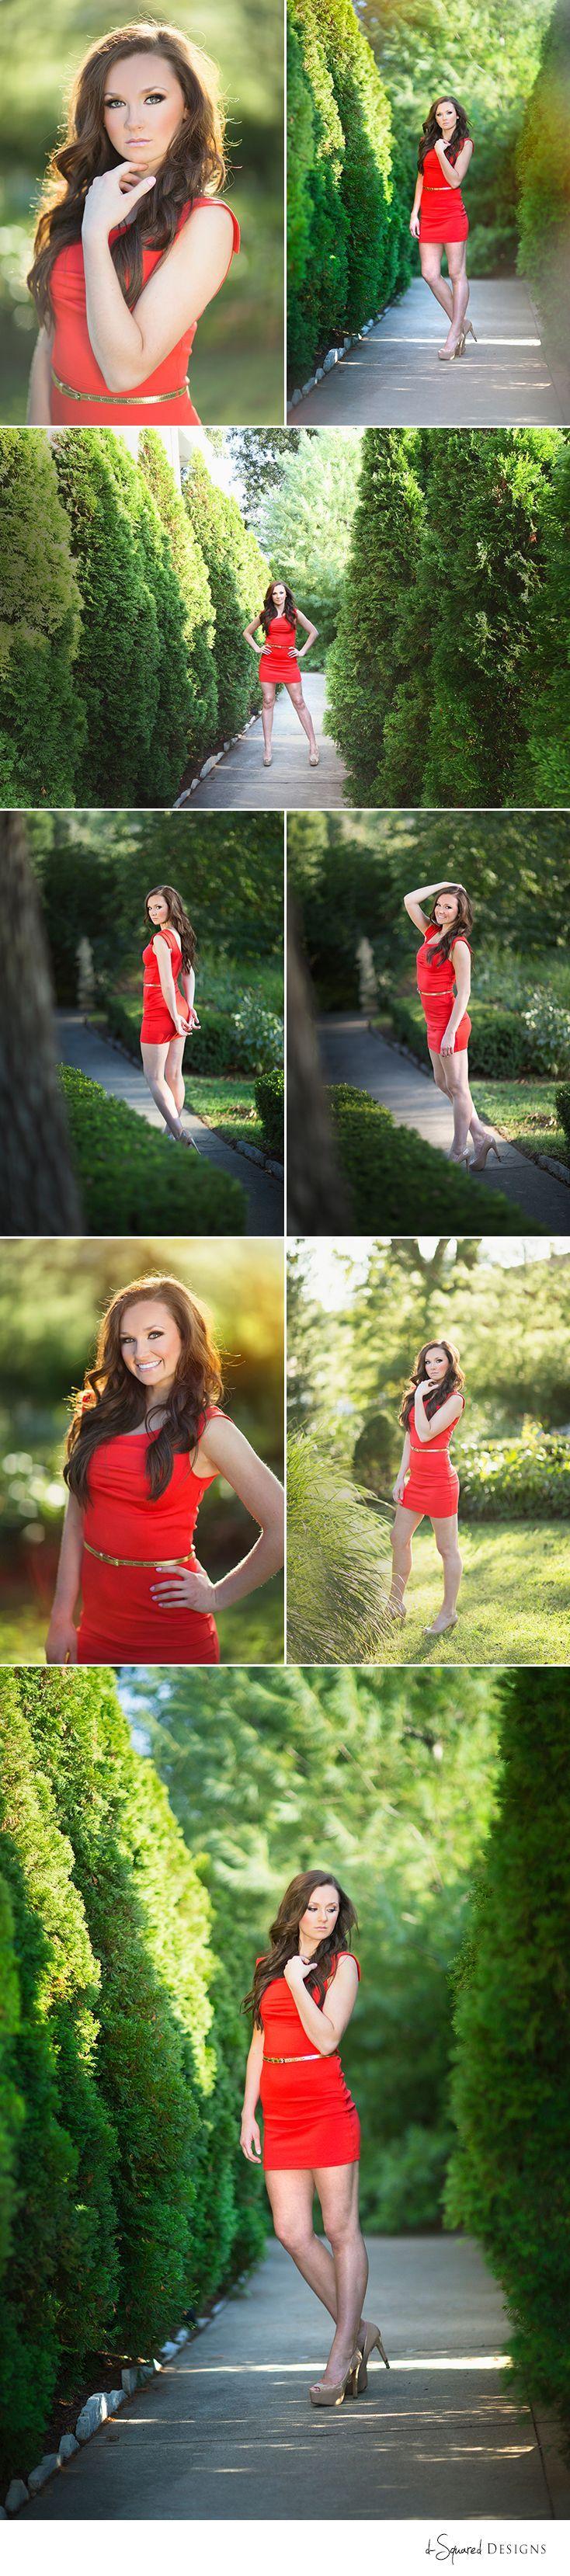 d-Squared Designs St. Genevieve, Missouri. Senior girl photography. Missouri Senior photographer. Southeast Missouri Photographer. Senior pose. Beautiful senior girl. Greenery. Senior session. Senior girl inspiration.